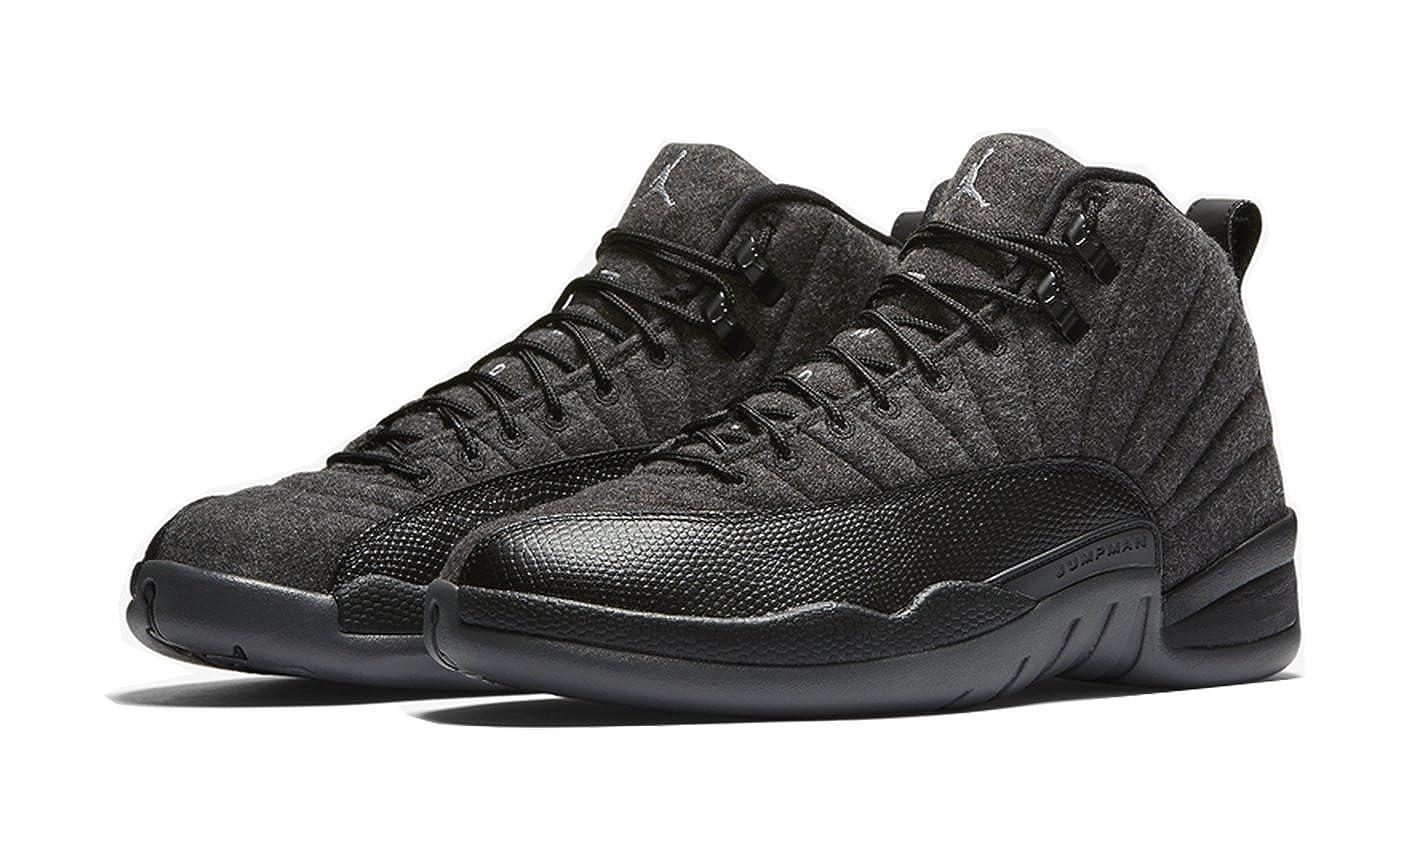 04652dc137df Foot Locker House of Hoops Air Jordan 12 Wool Dark-Grey/Metallic  Silver-Black 852627-003 October 1, 2016 Release Shoe Size (8): Amazon.ca:  Shoes & Handbags